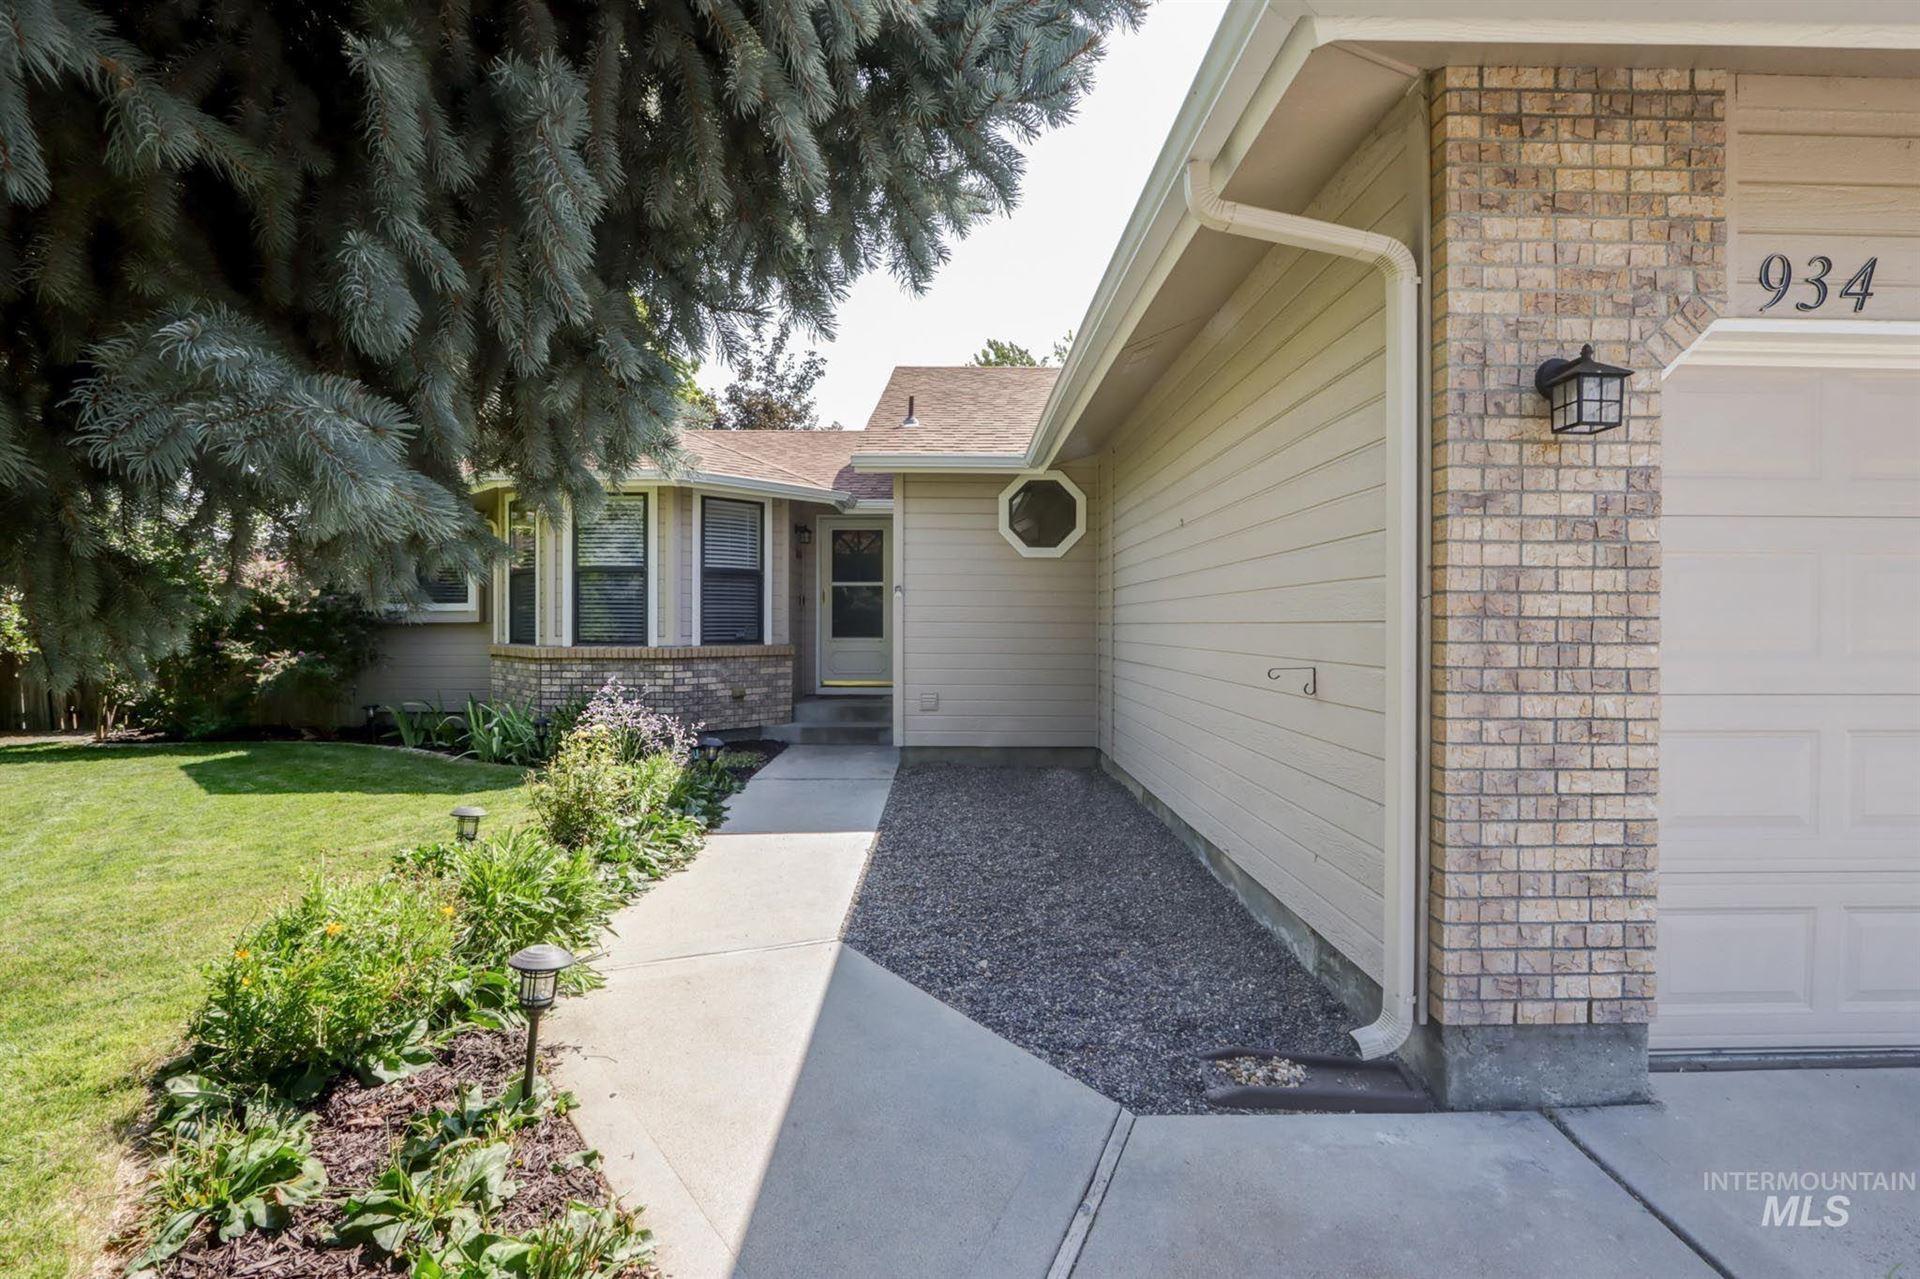 934 N Iris Place, Boise, ID 83704 - MLS#: 98822582